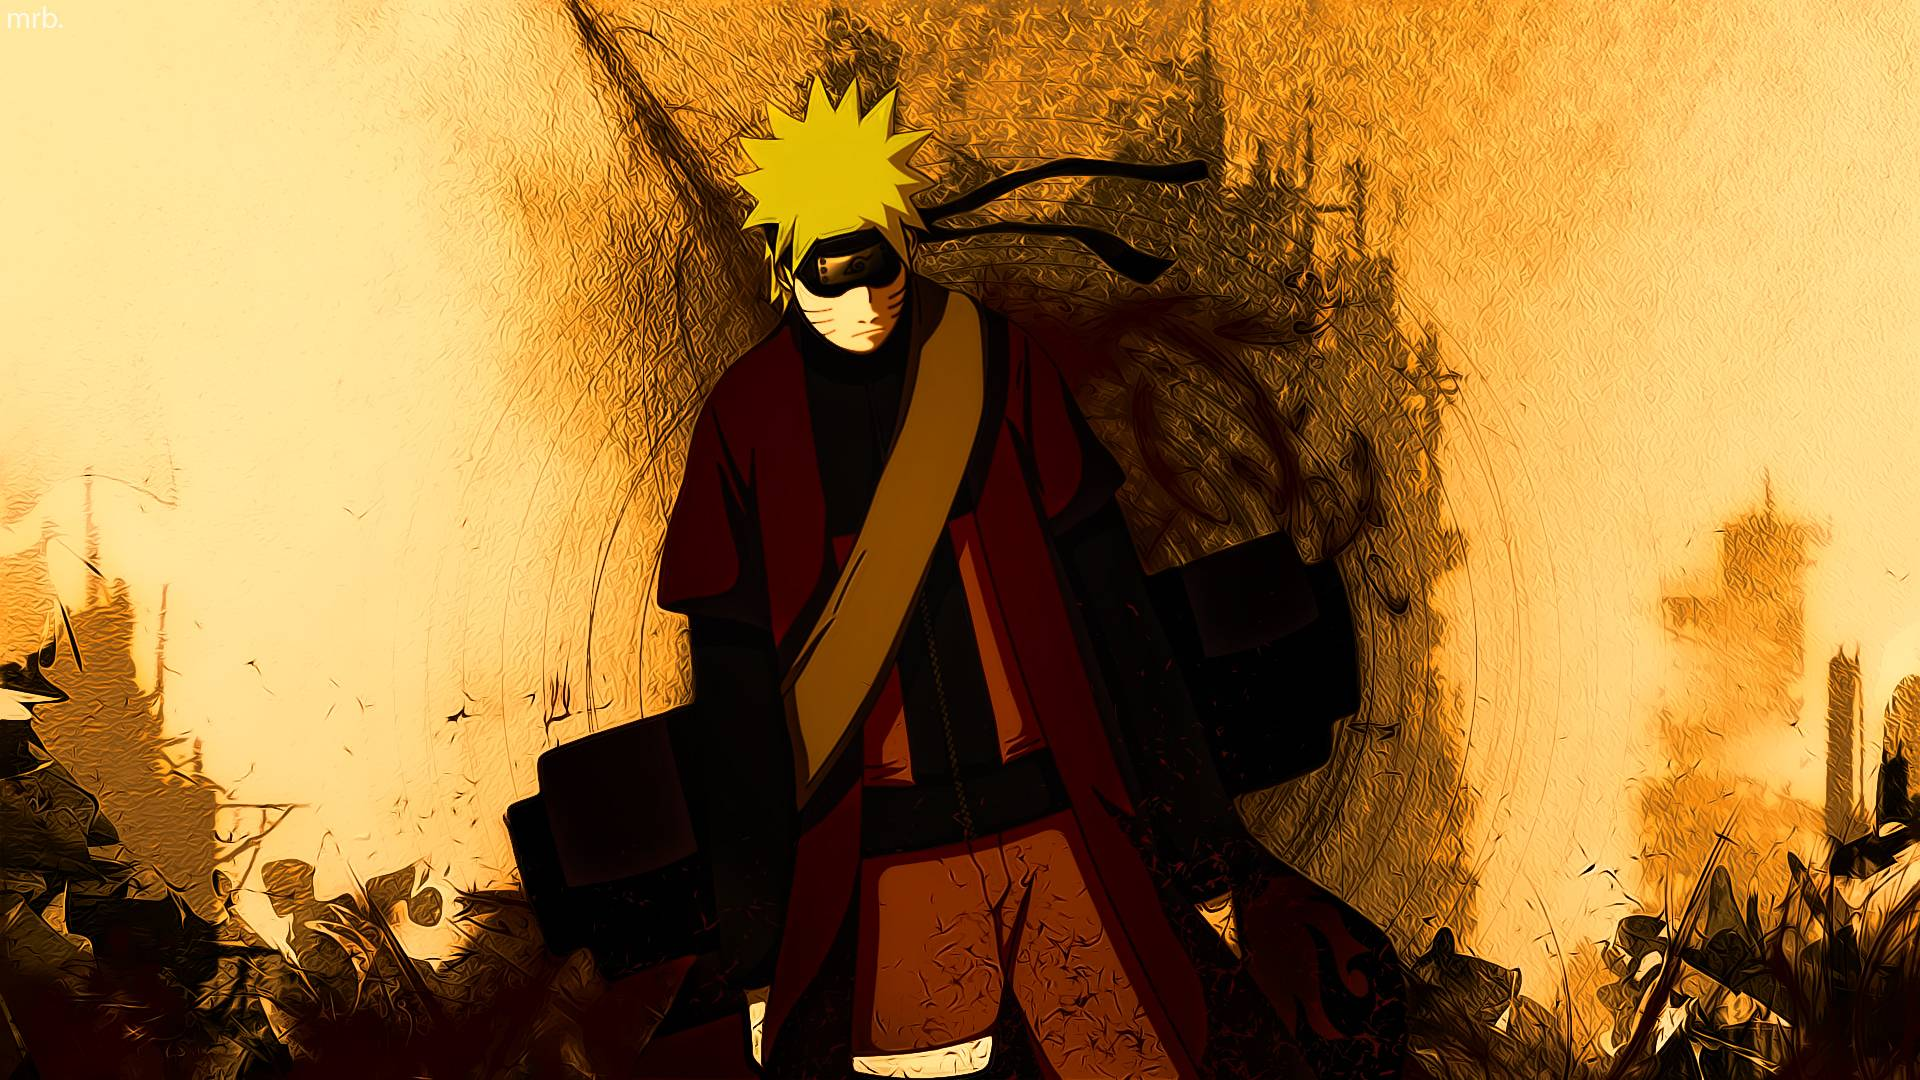 Naruto Wallpapers 1920x1080 - Wallpaper Cave